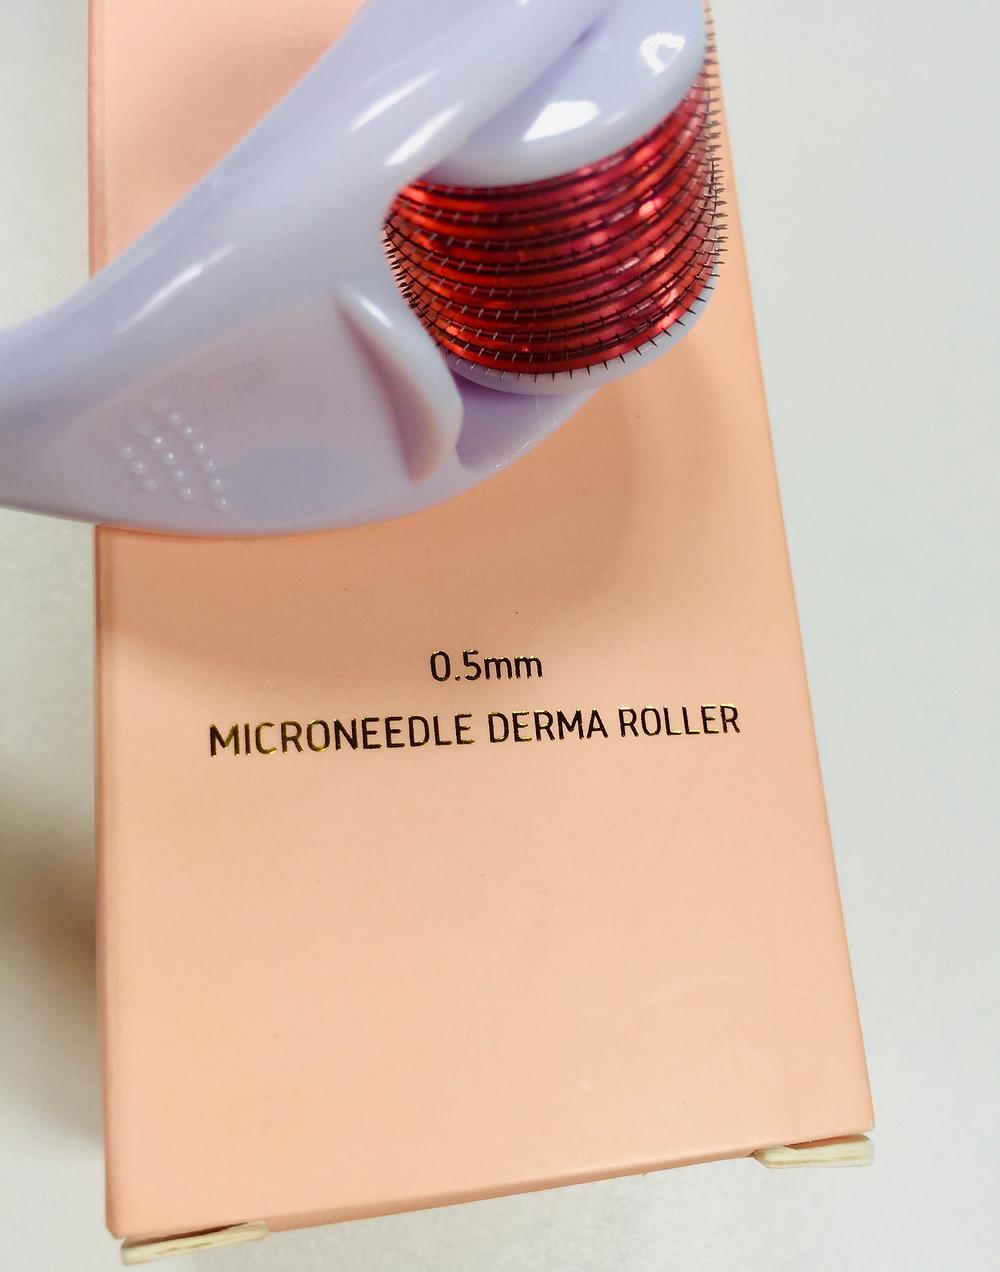 0.5mm derma roller